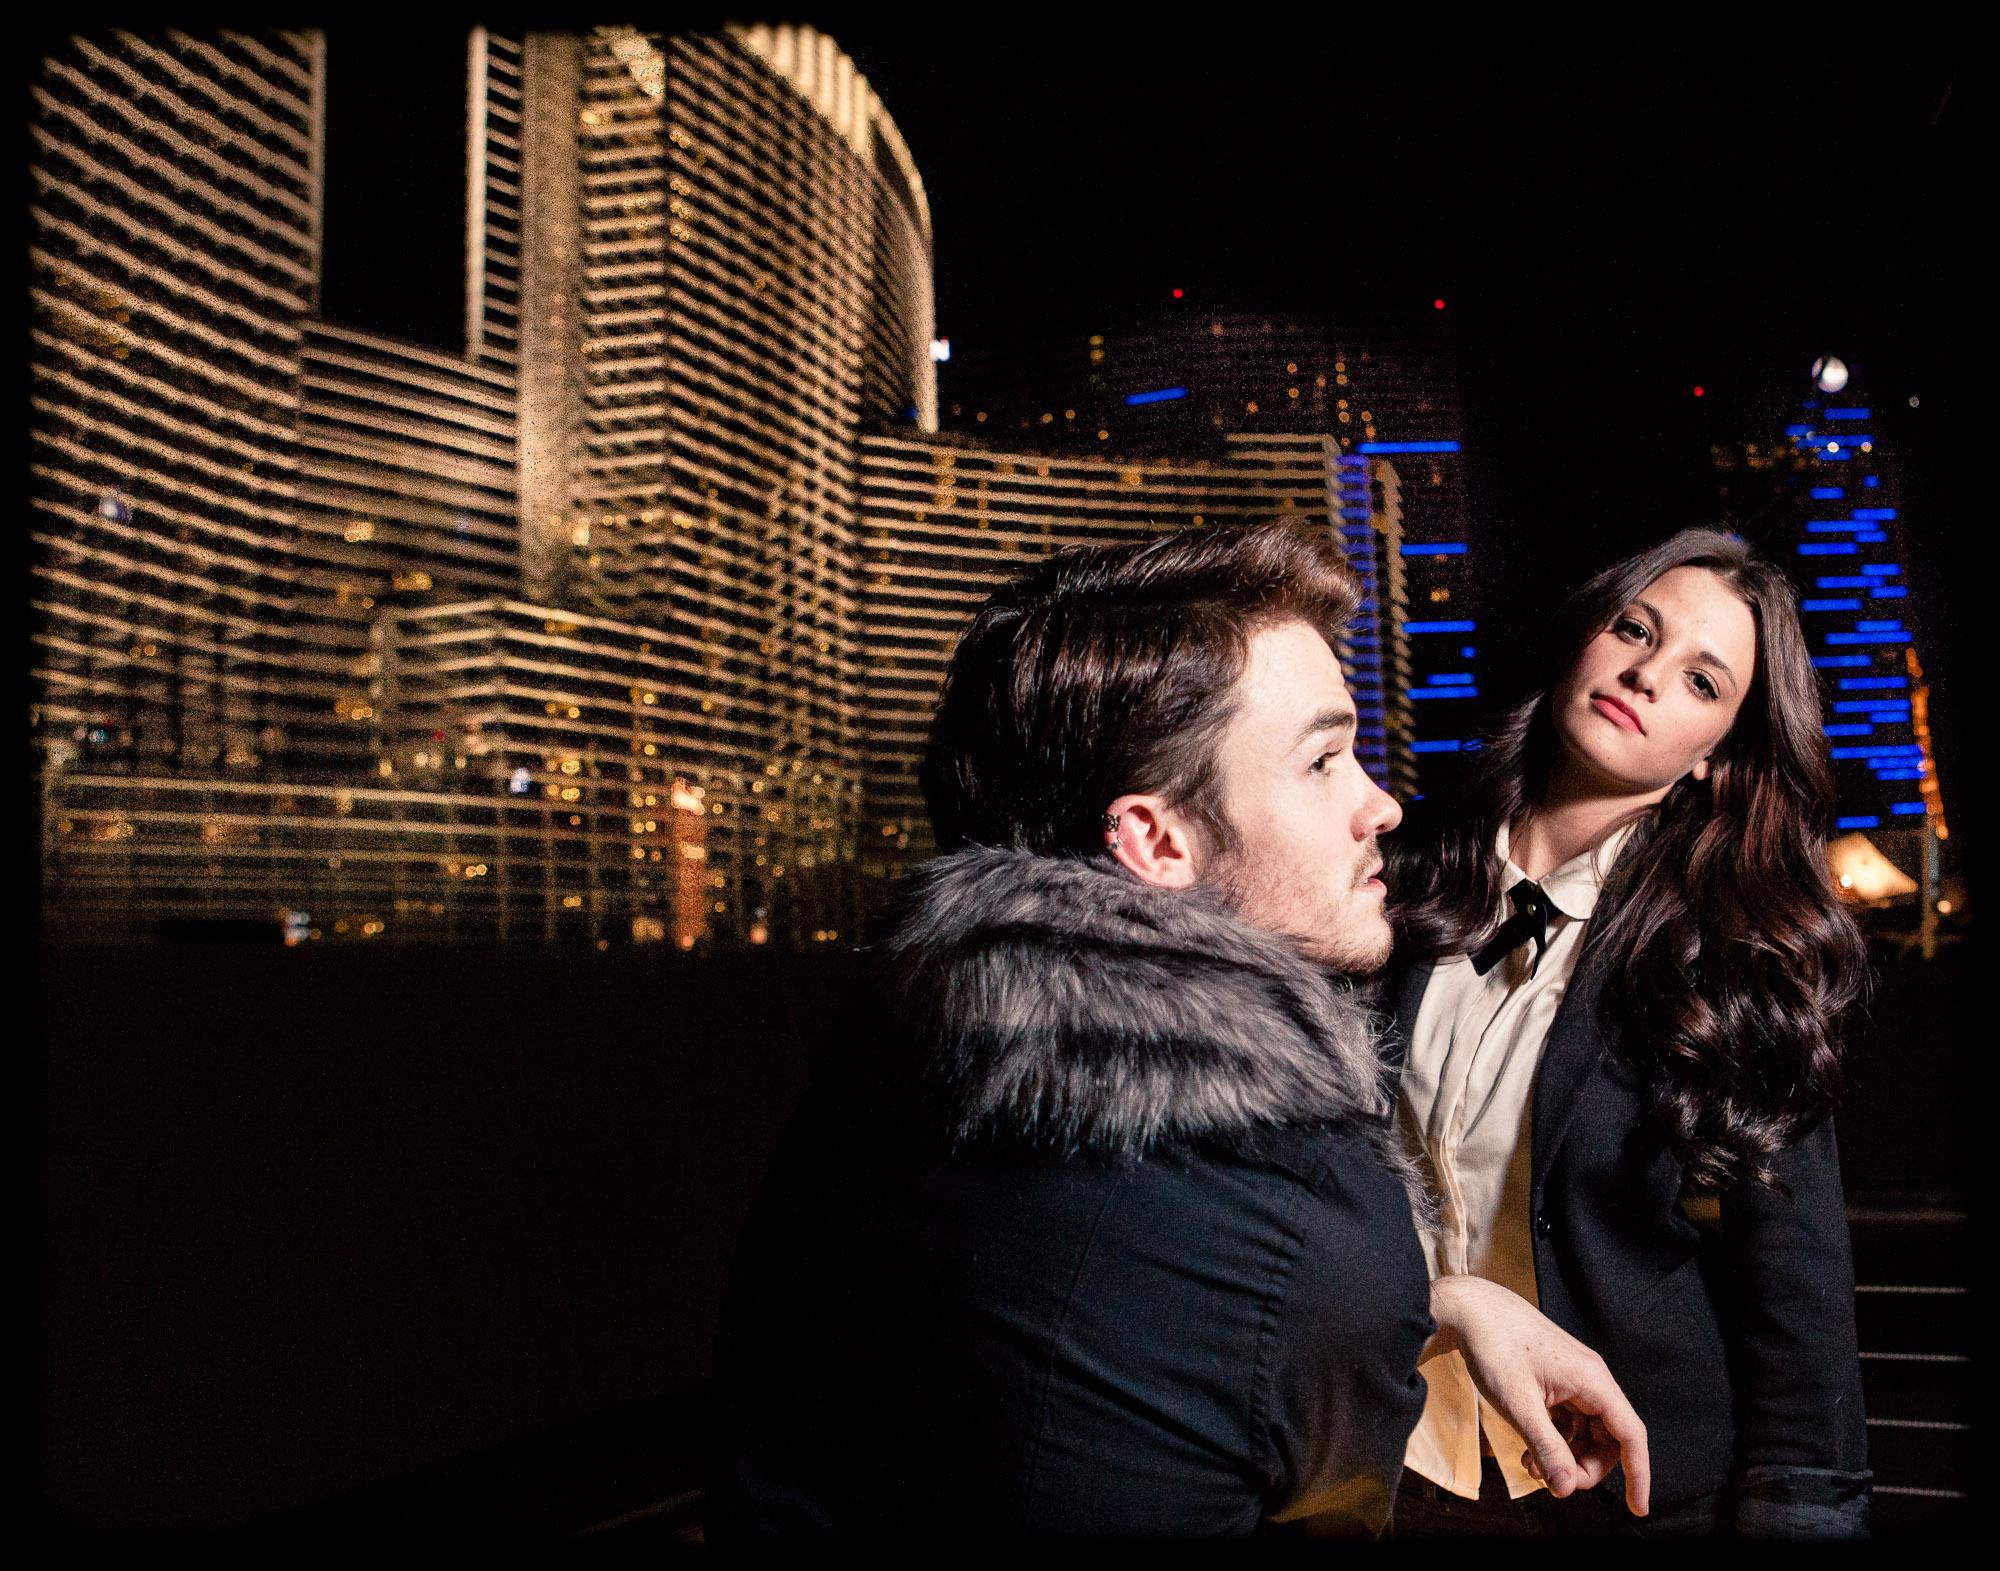 Lauren & Joseph finally getting serious - facing the Cosmo & Aria